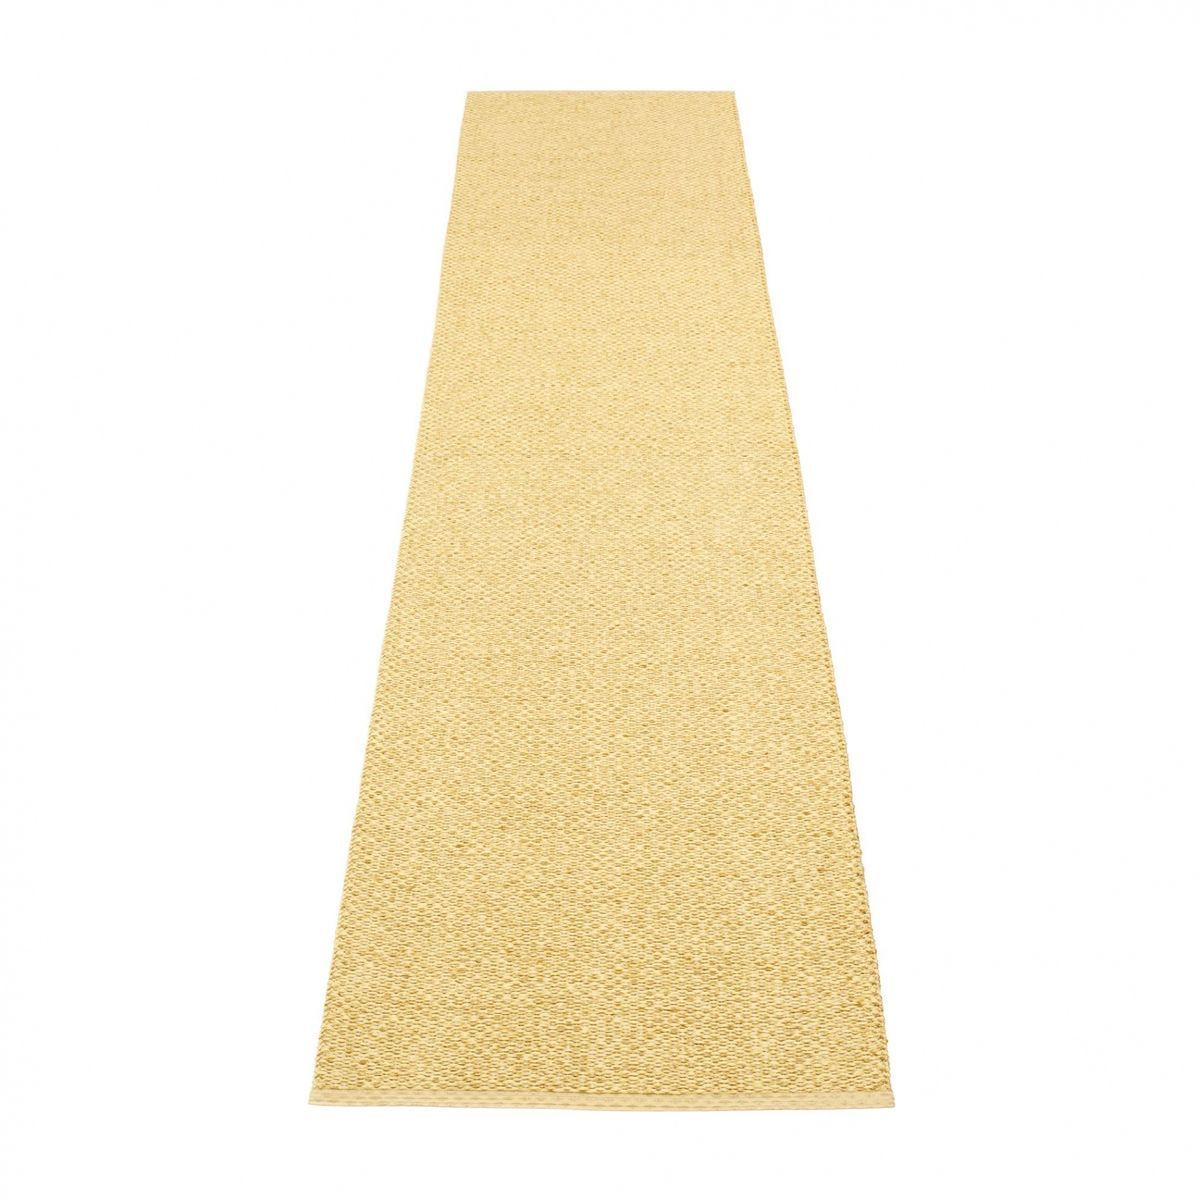 svea teppich 70x320cm pappelina l ufer teppiche textilien. Black Bedroom Furniture Sets. Home Design Ideas